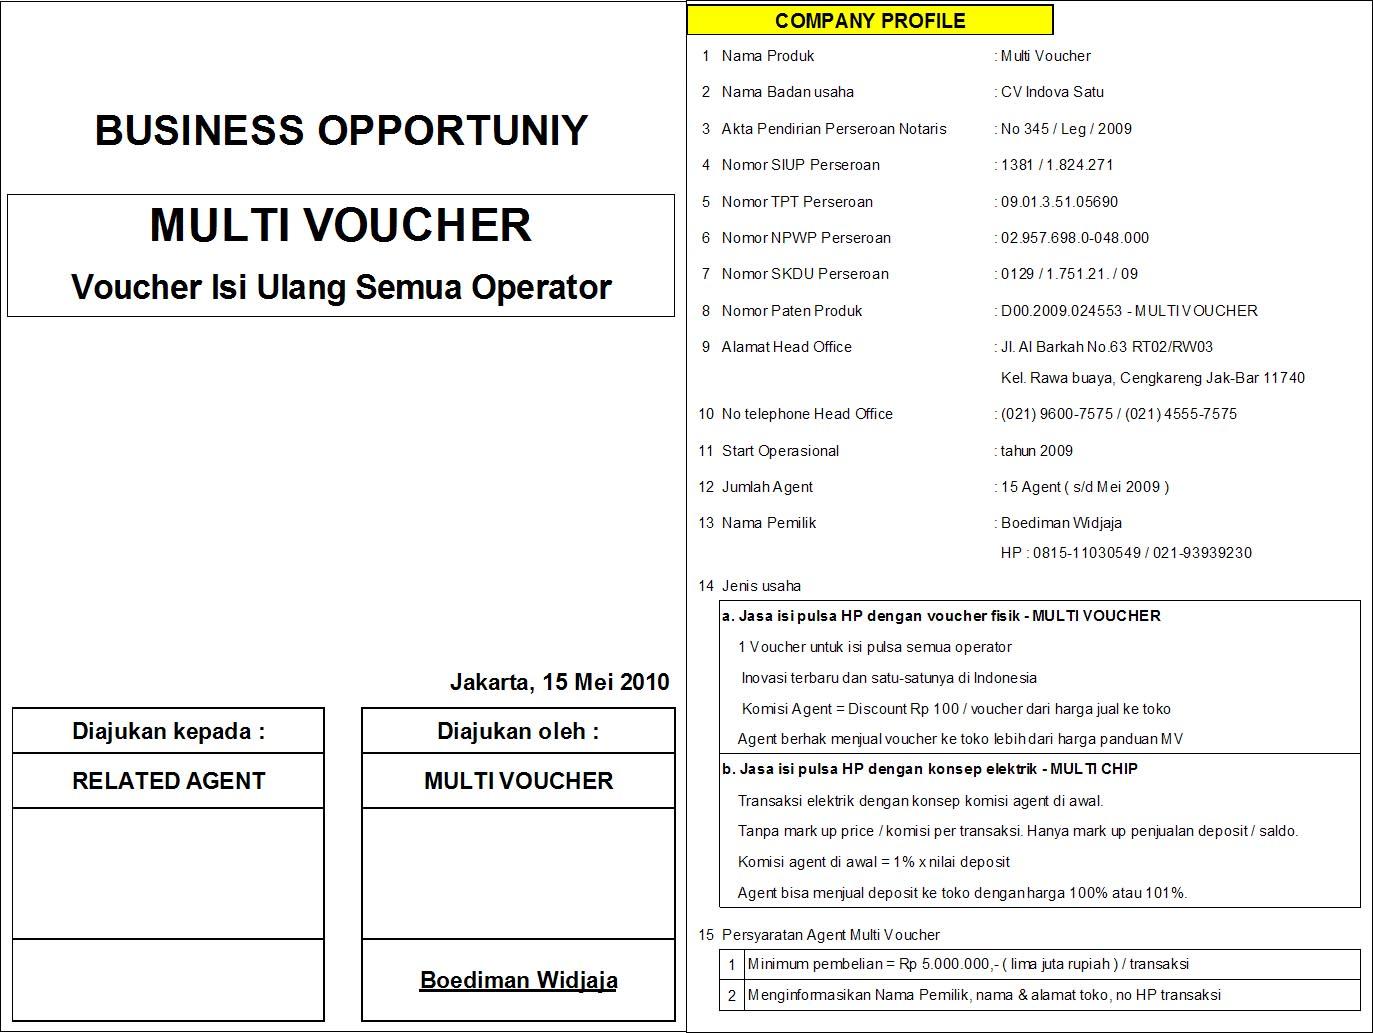 Multi Voucher Distributor Fisik Operator Xl Profile Mv 17 Mei 2010